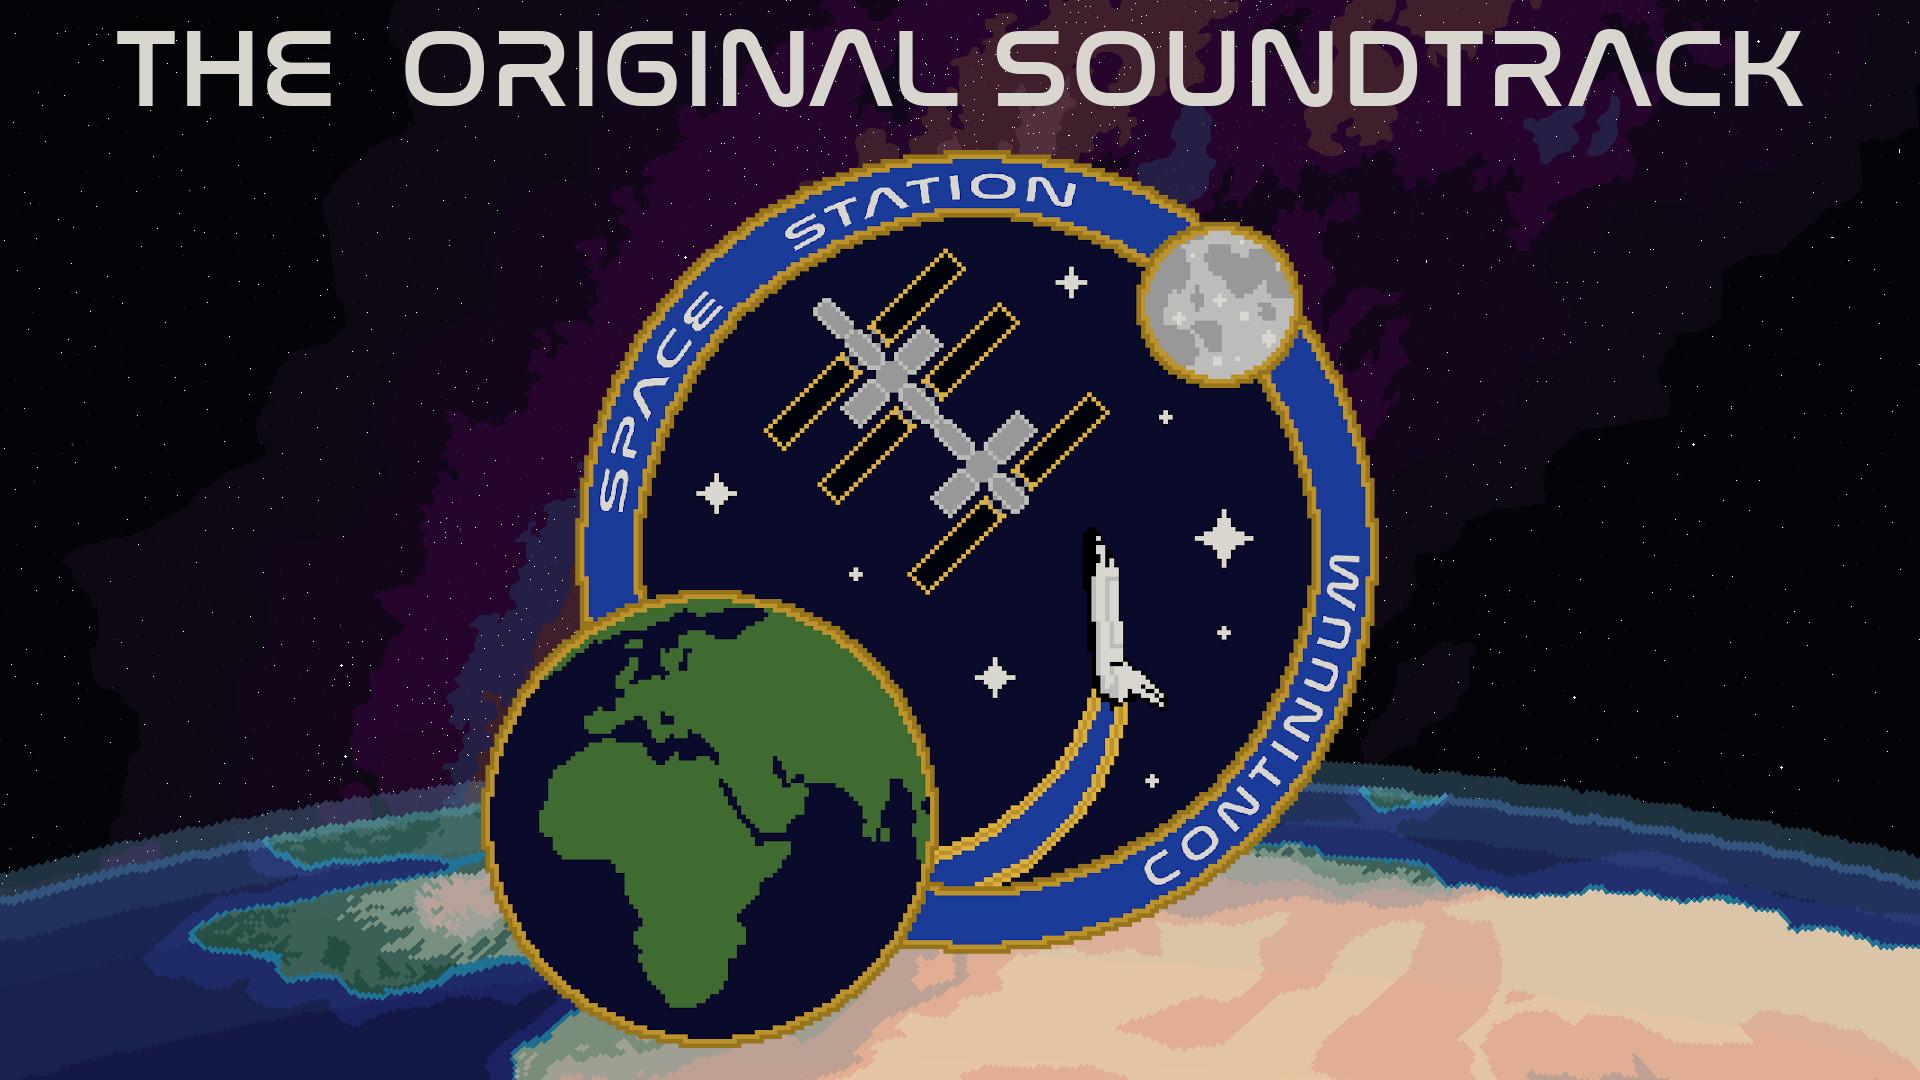 Space Station Continuum Soundtrack screenshot